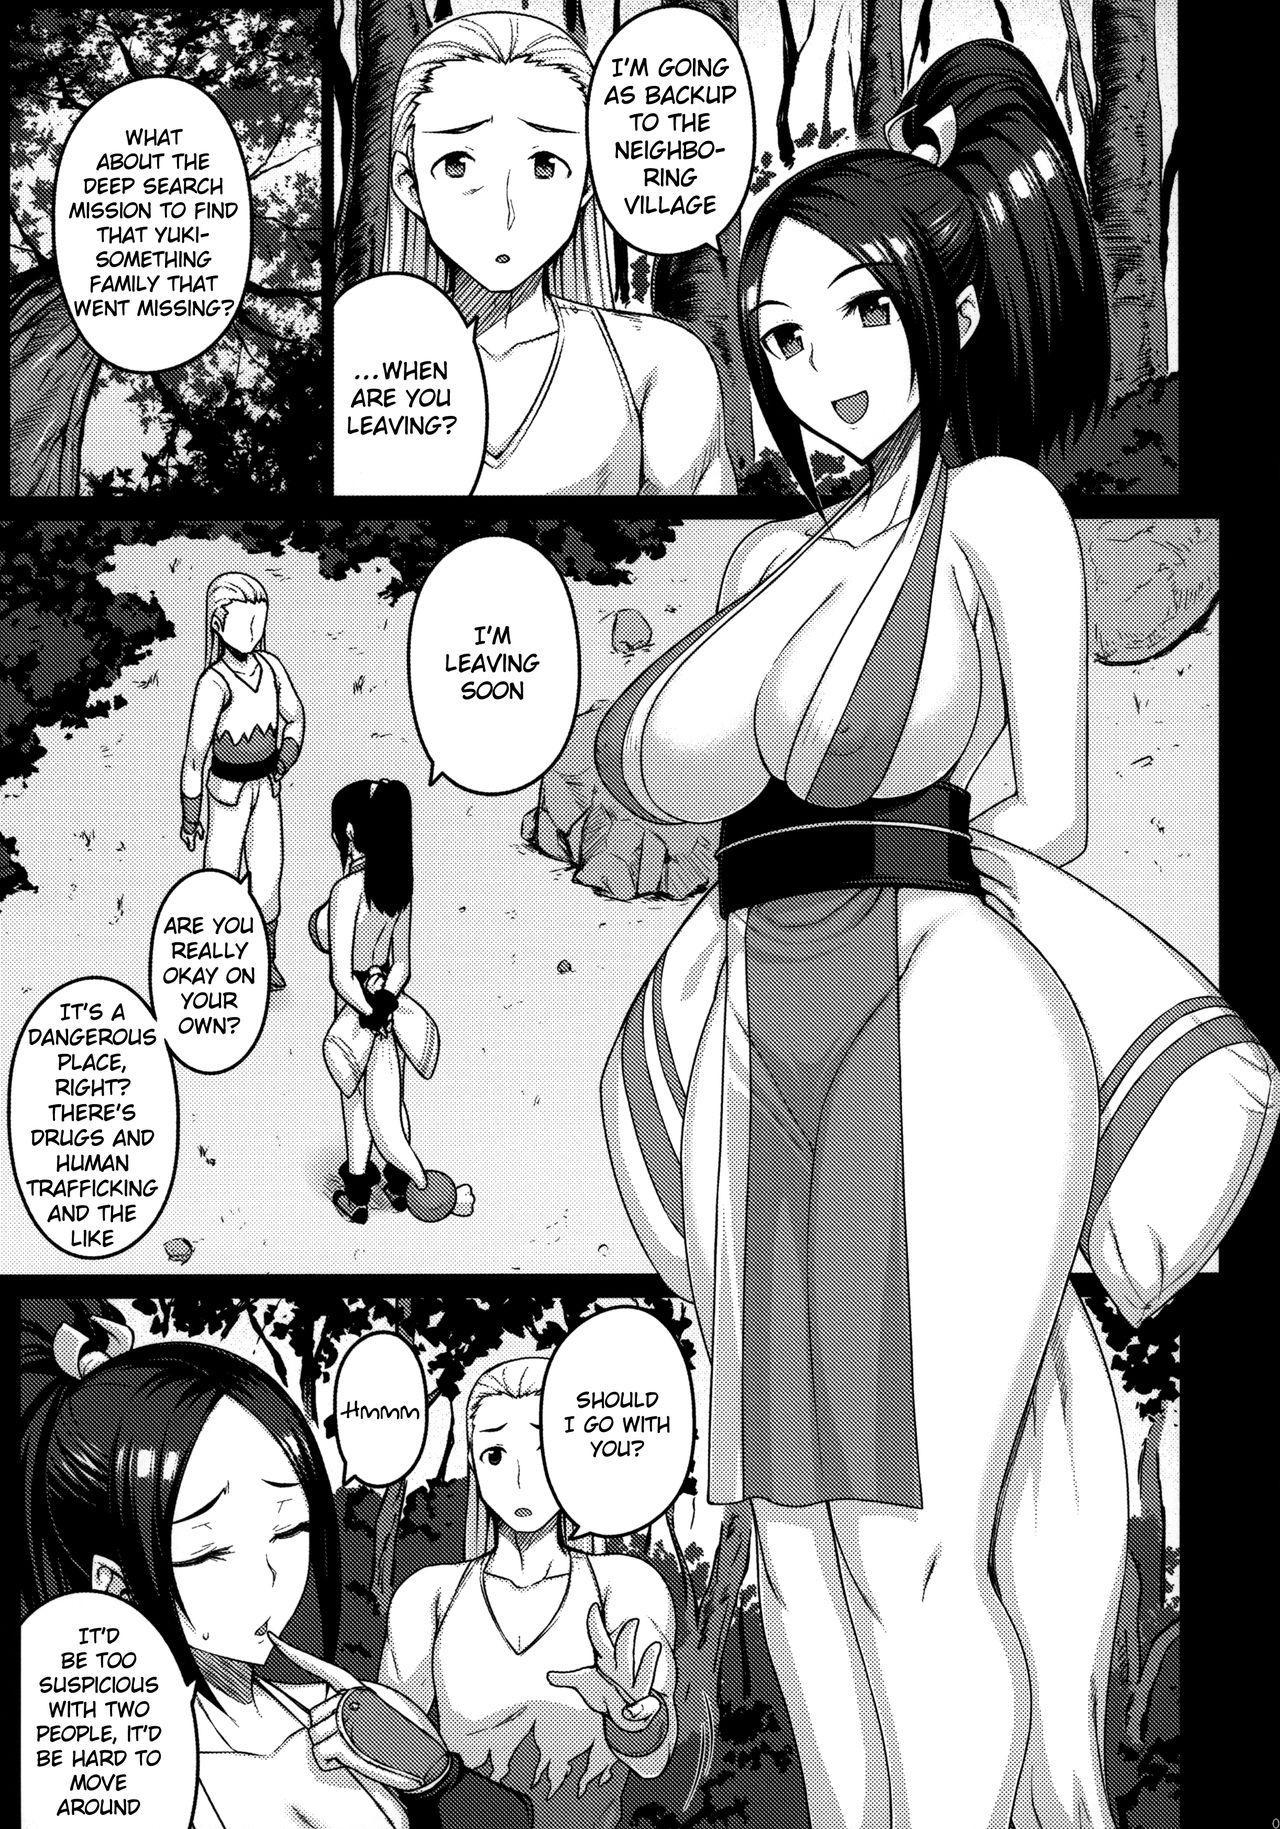 Daraku no hana   Flower of depravity 3